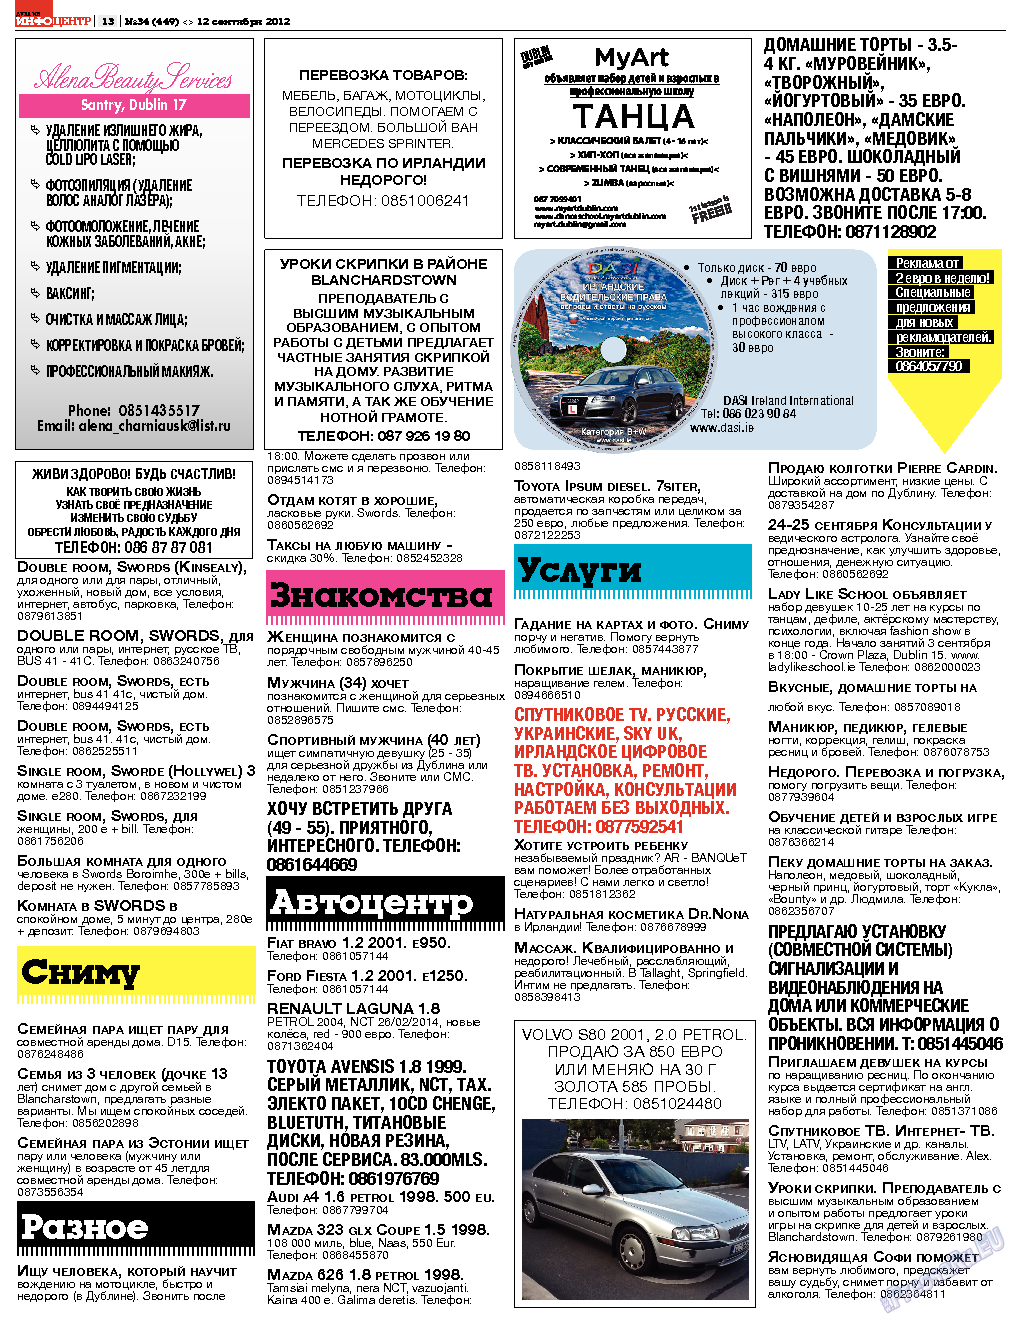 Дублин инфоцентр (газета). 2012 год, номер 34, стр. 13